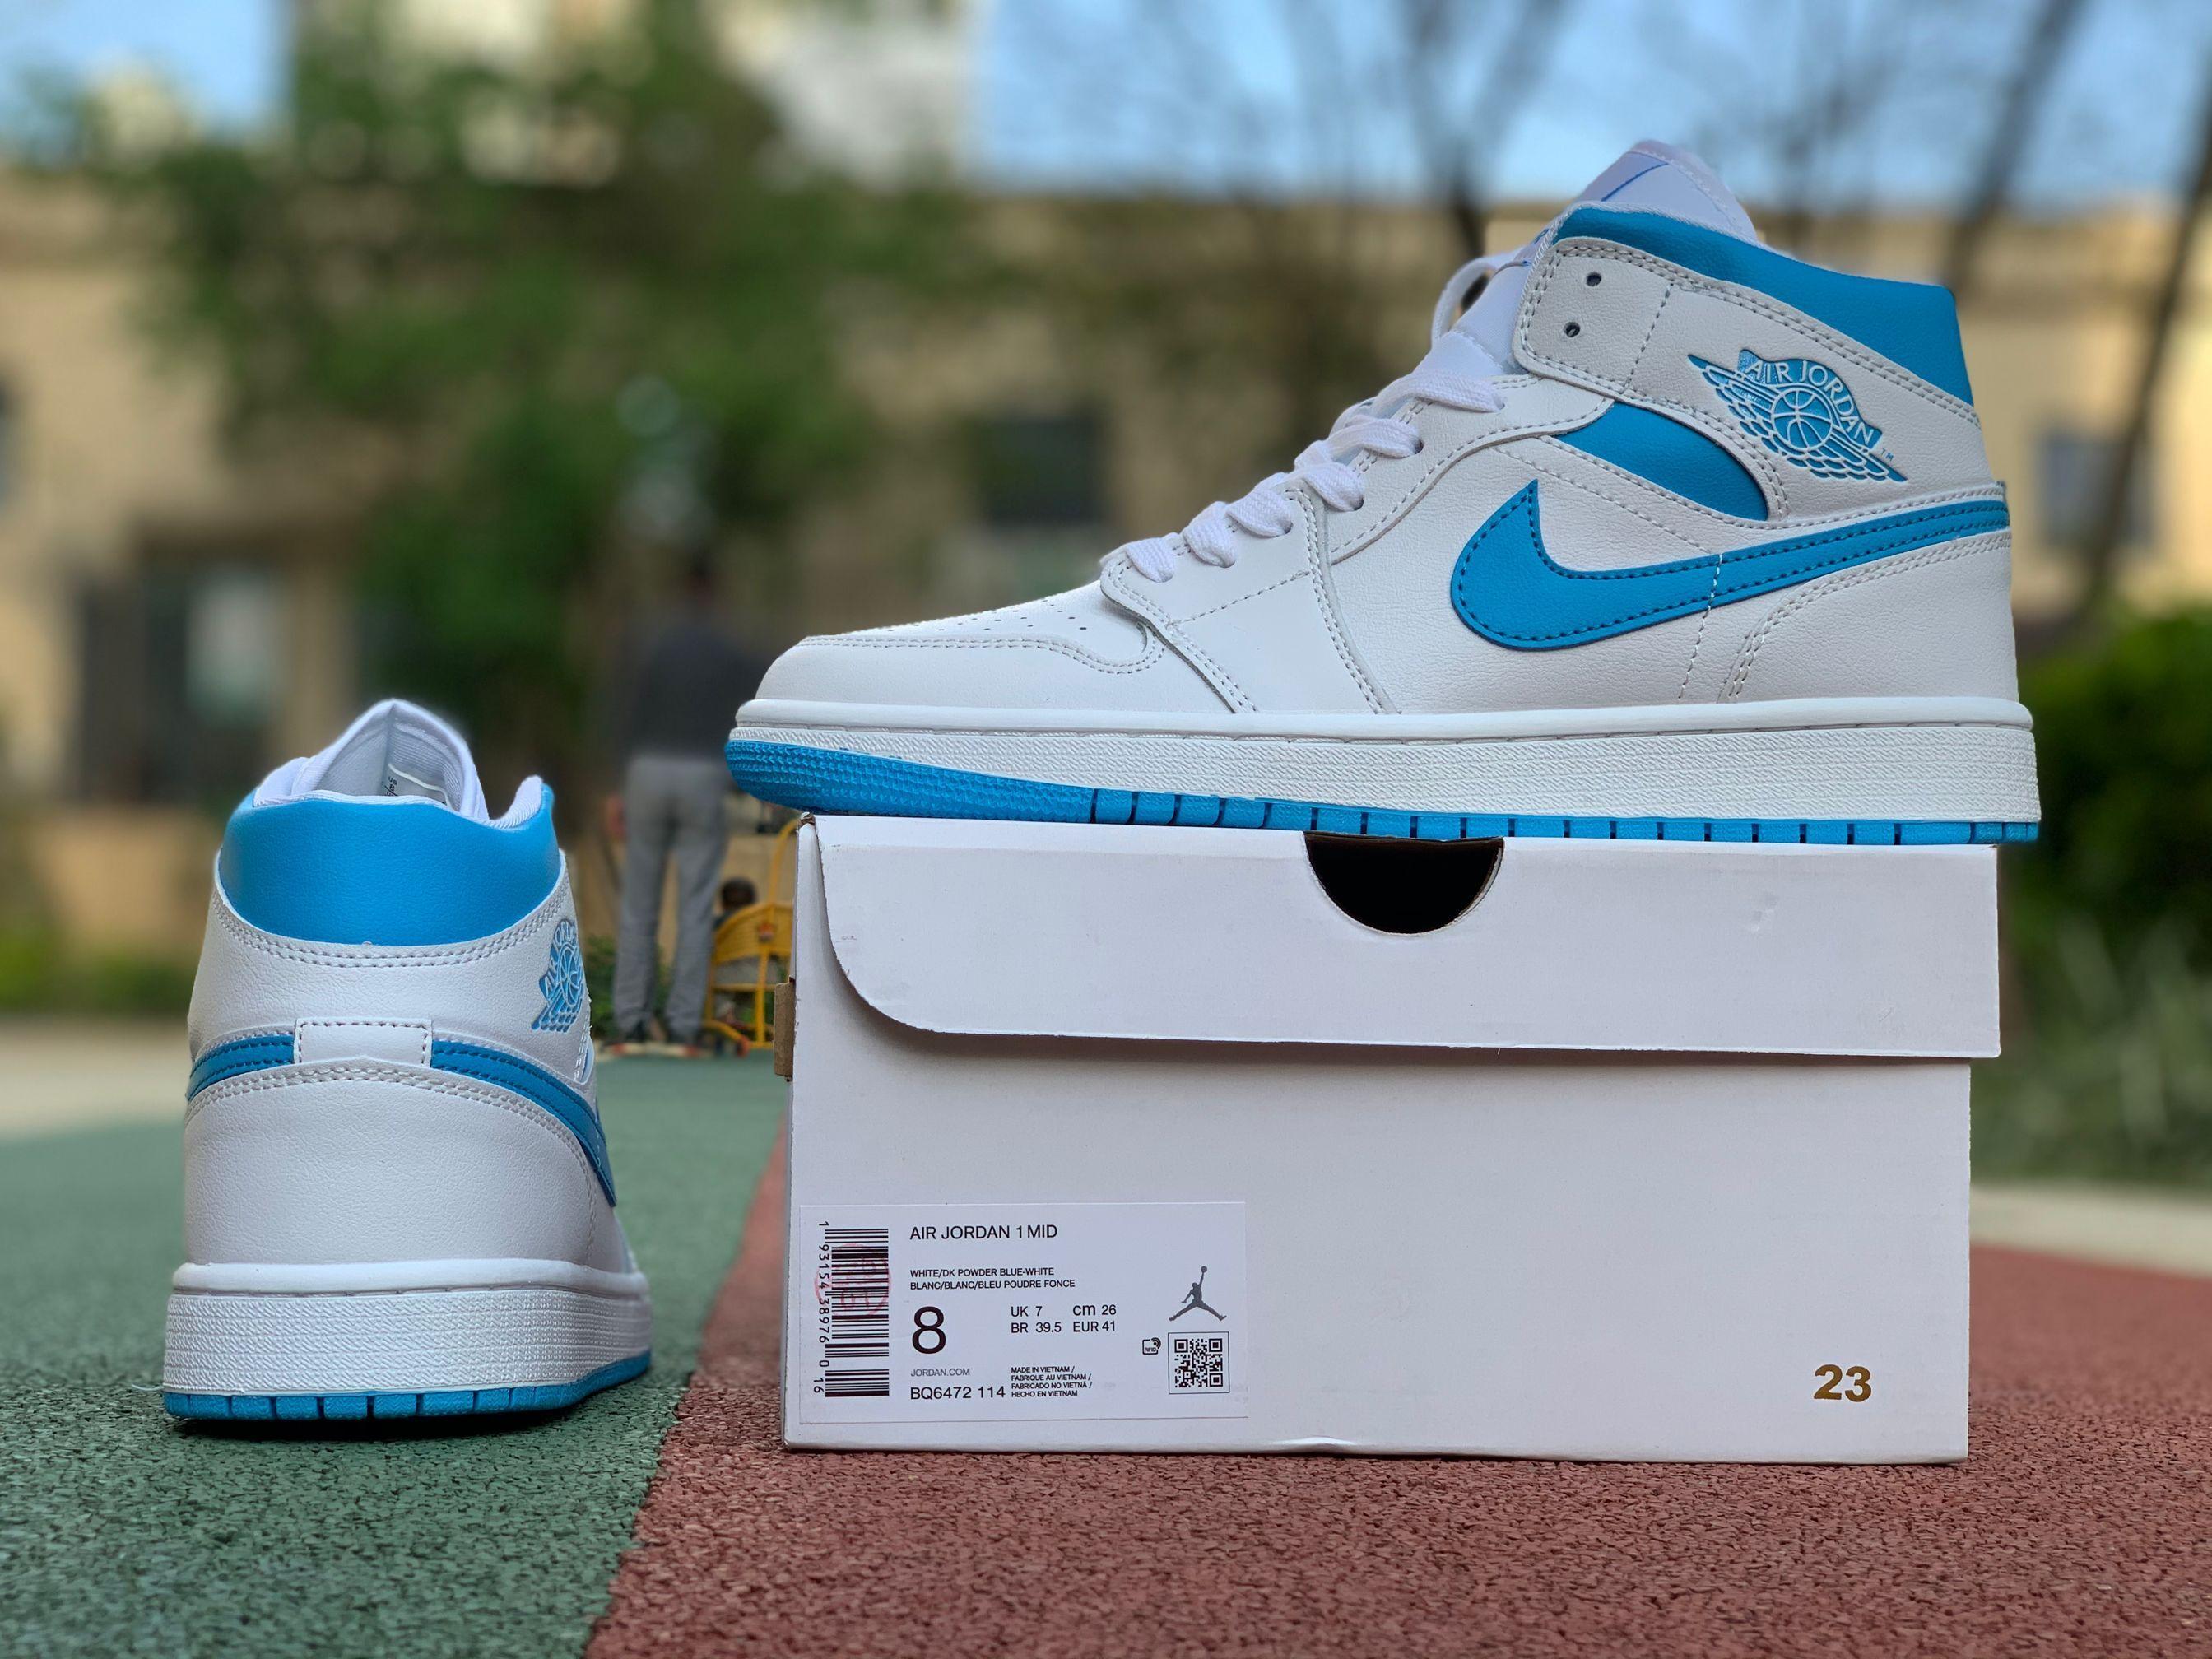 2020 Air Jordan 1 Mid Unc Basketball Shoes Bq6472 114 Blue Basketball Shoes Air Jordans Jordan Shoes New Release